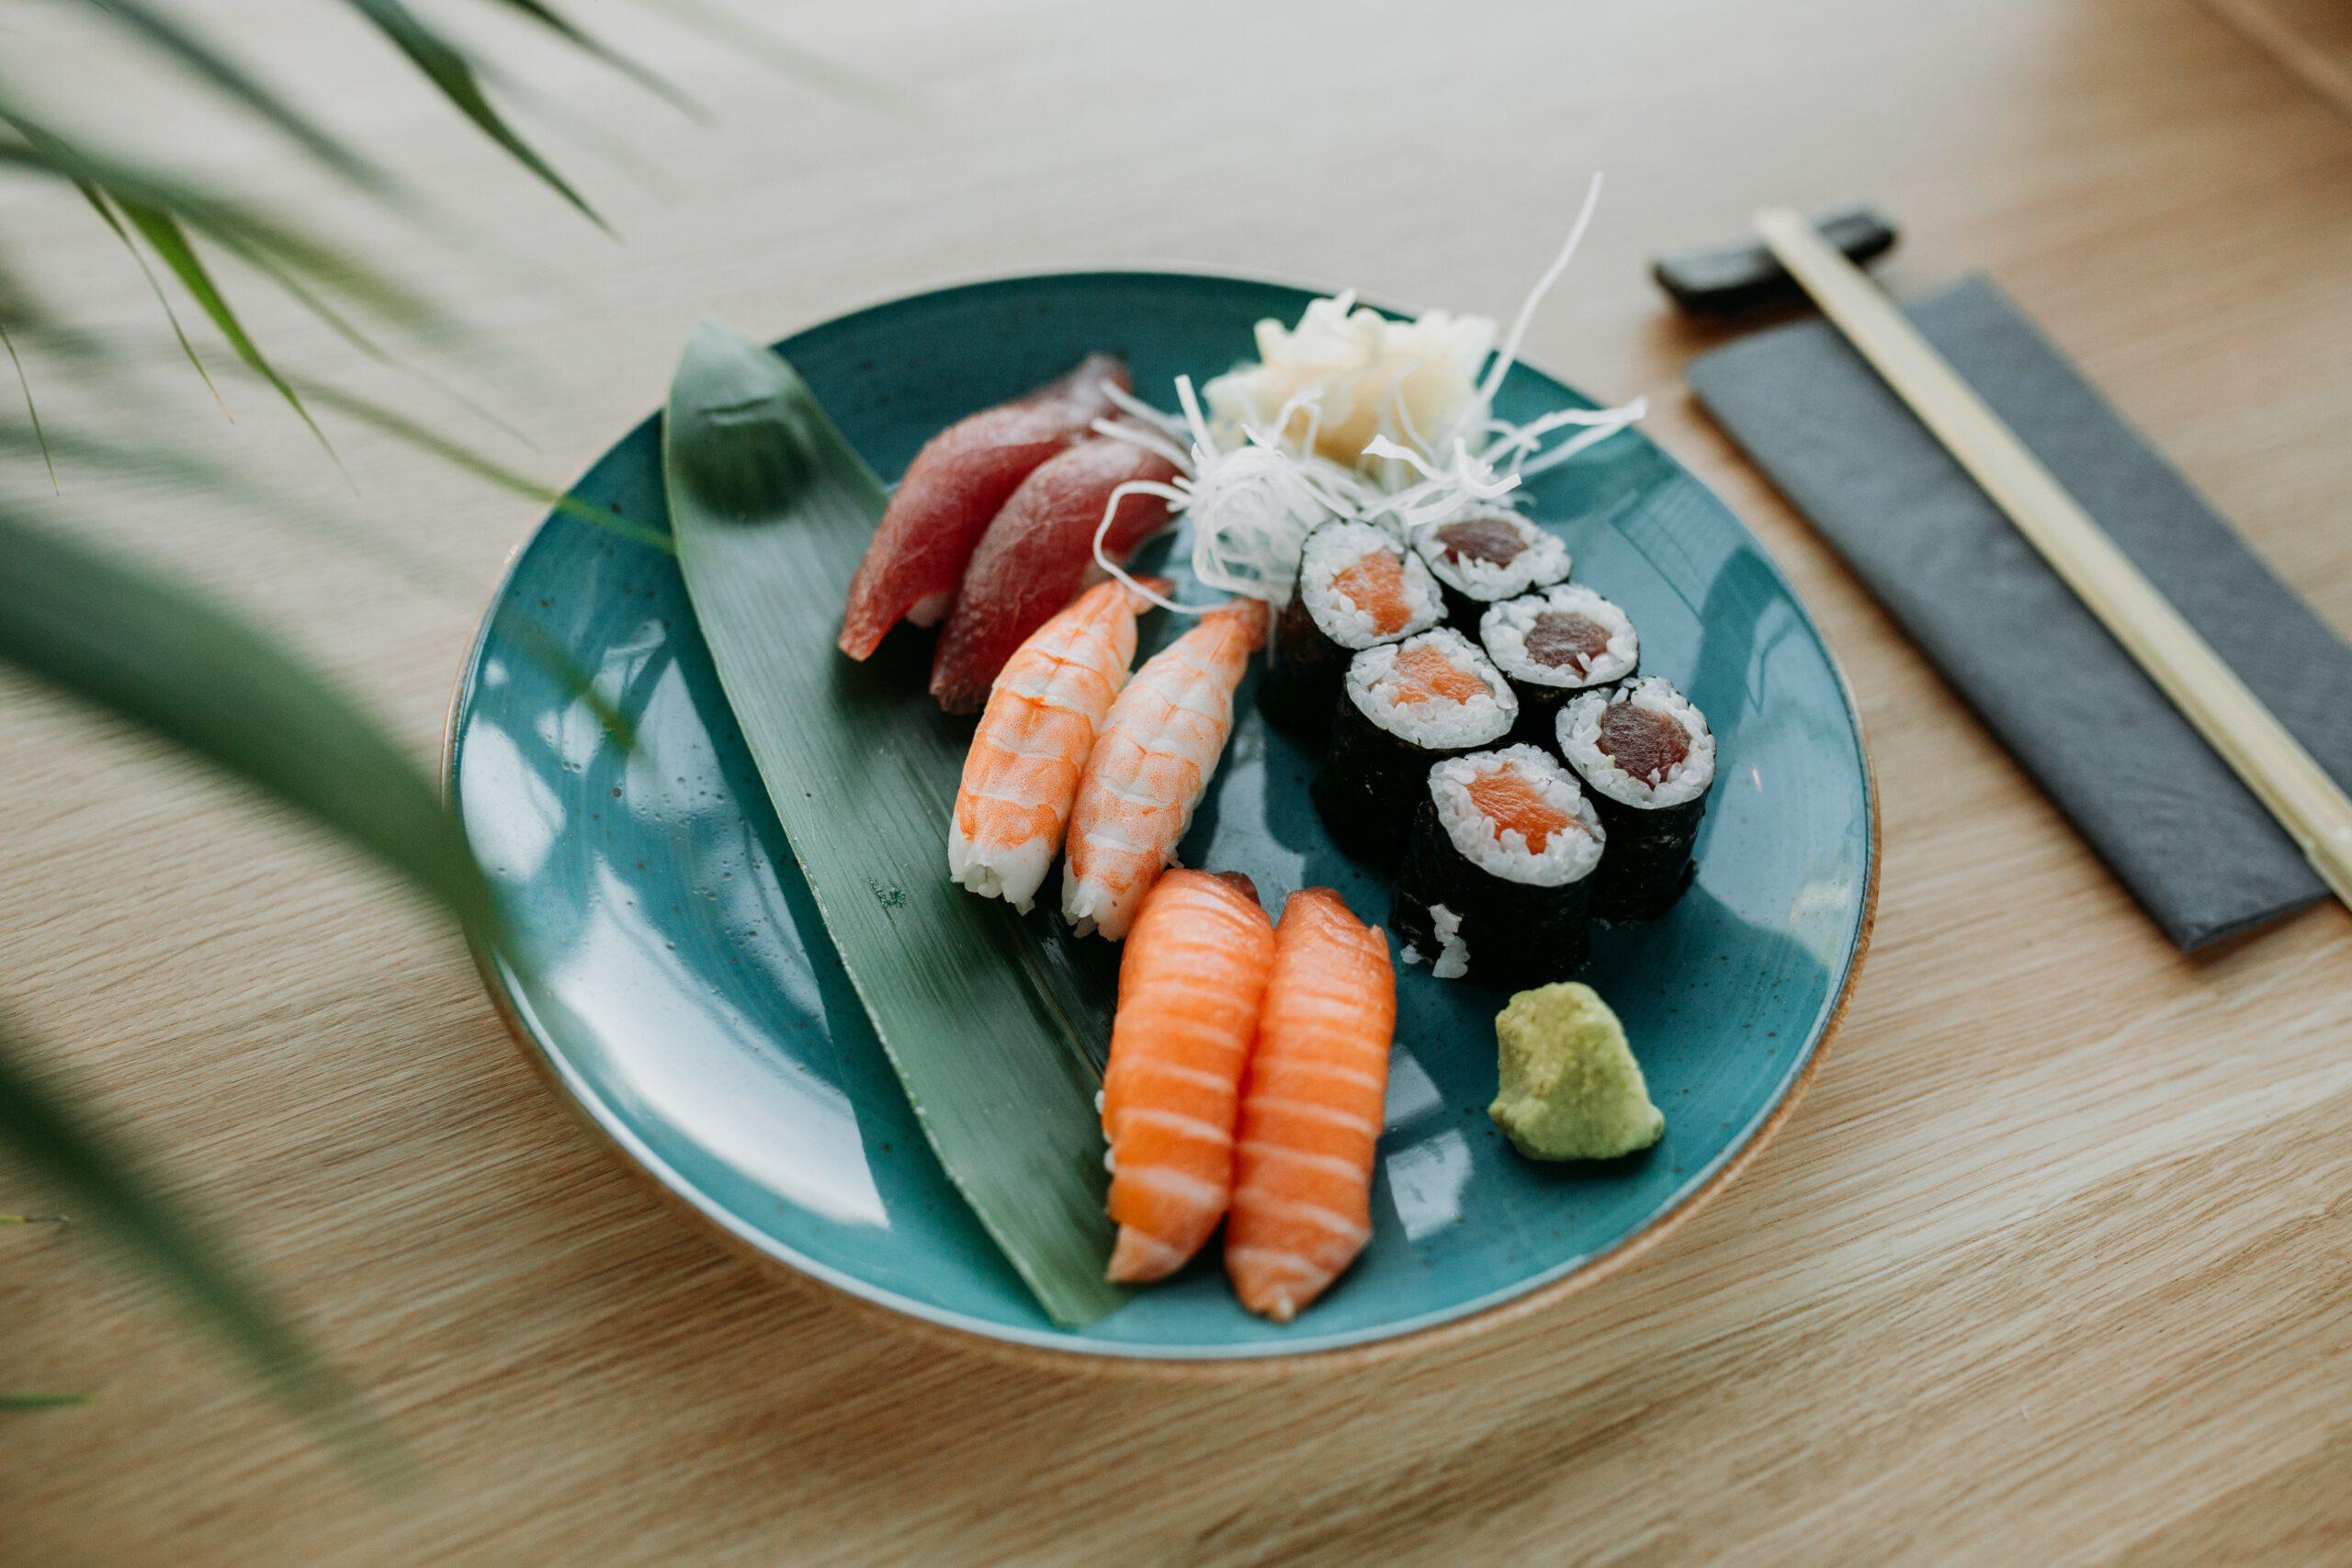 Asia-sushi-bar – Wicküler City, Wuppertal